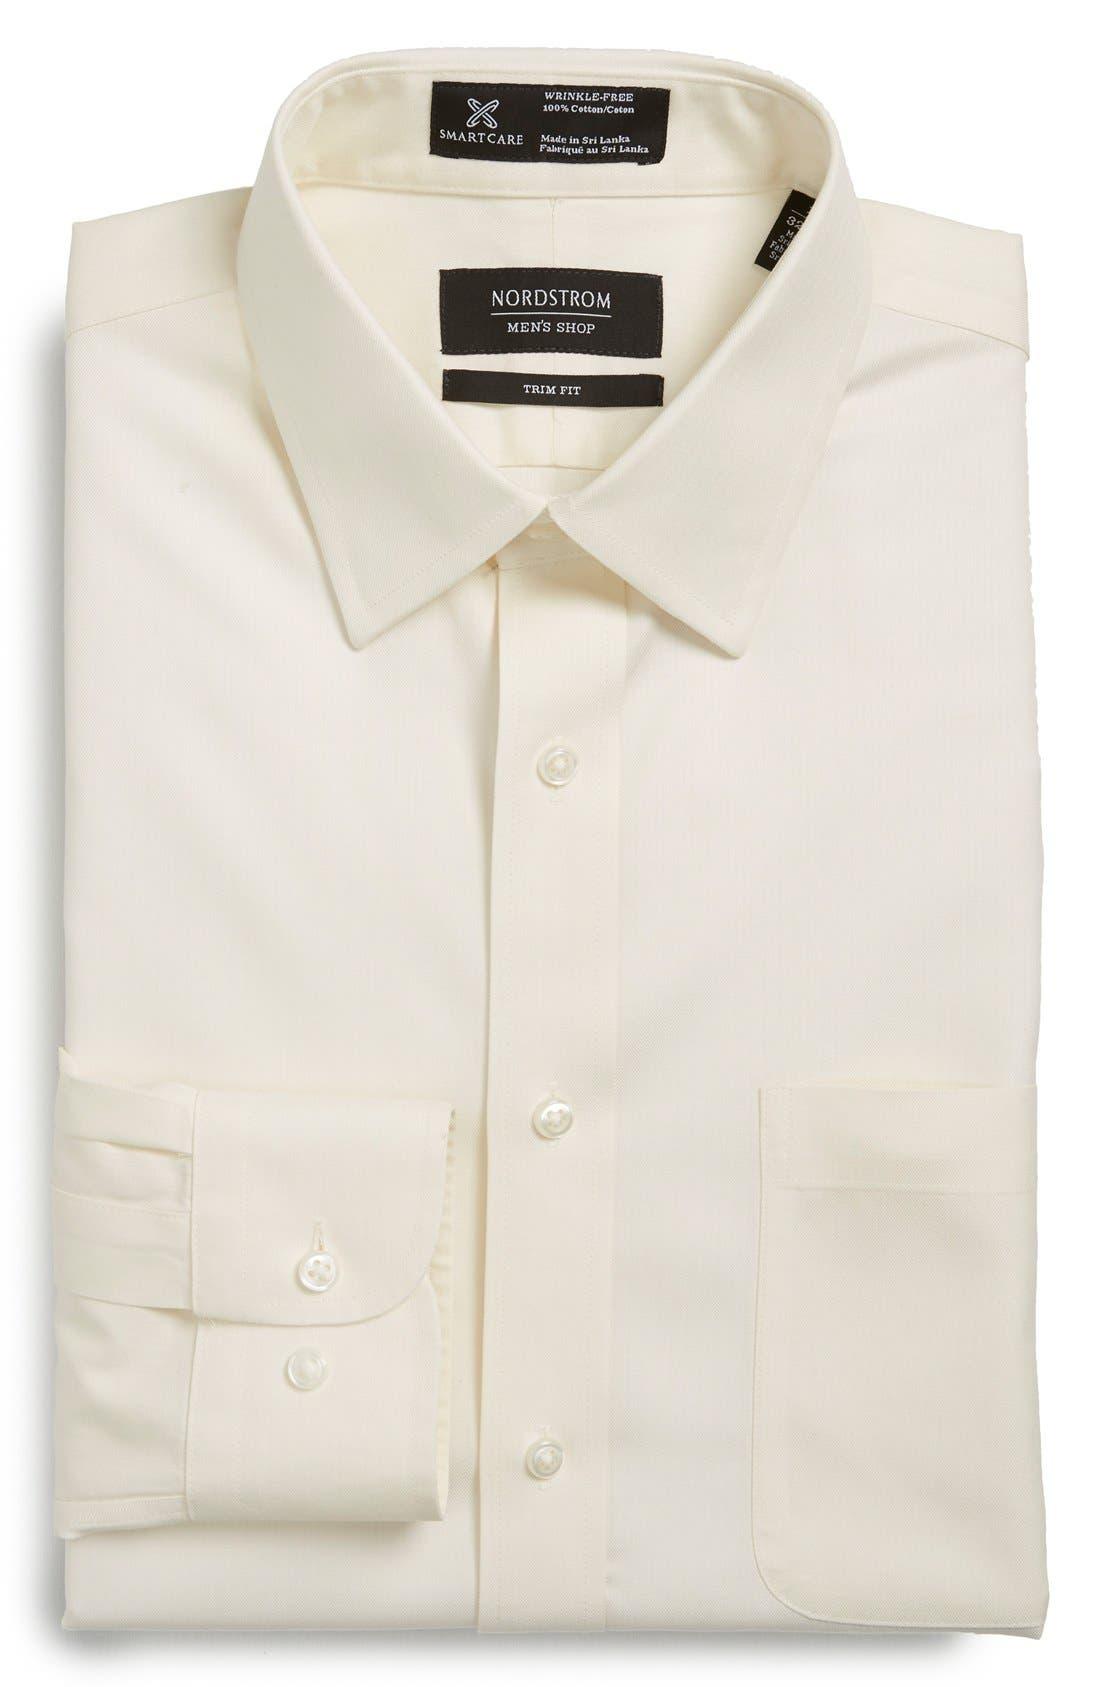 Main Image - Nordstrom Men's Shop Smartcare™ Wrinkle Free Herringbone Trim Fit Dress Shirt